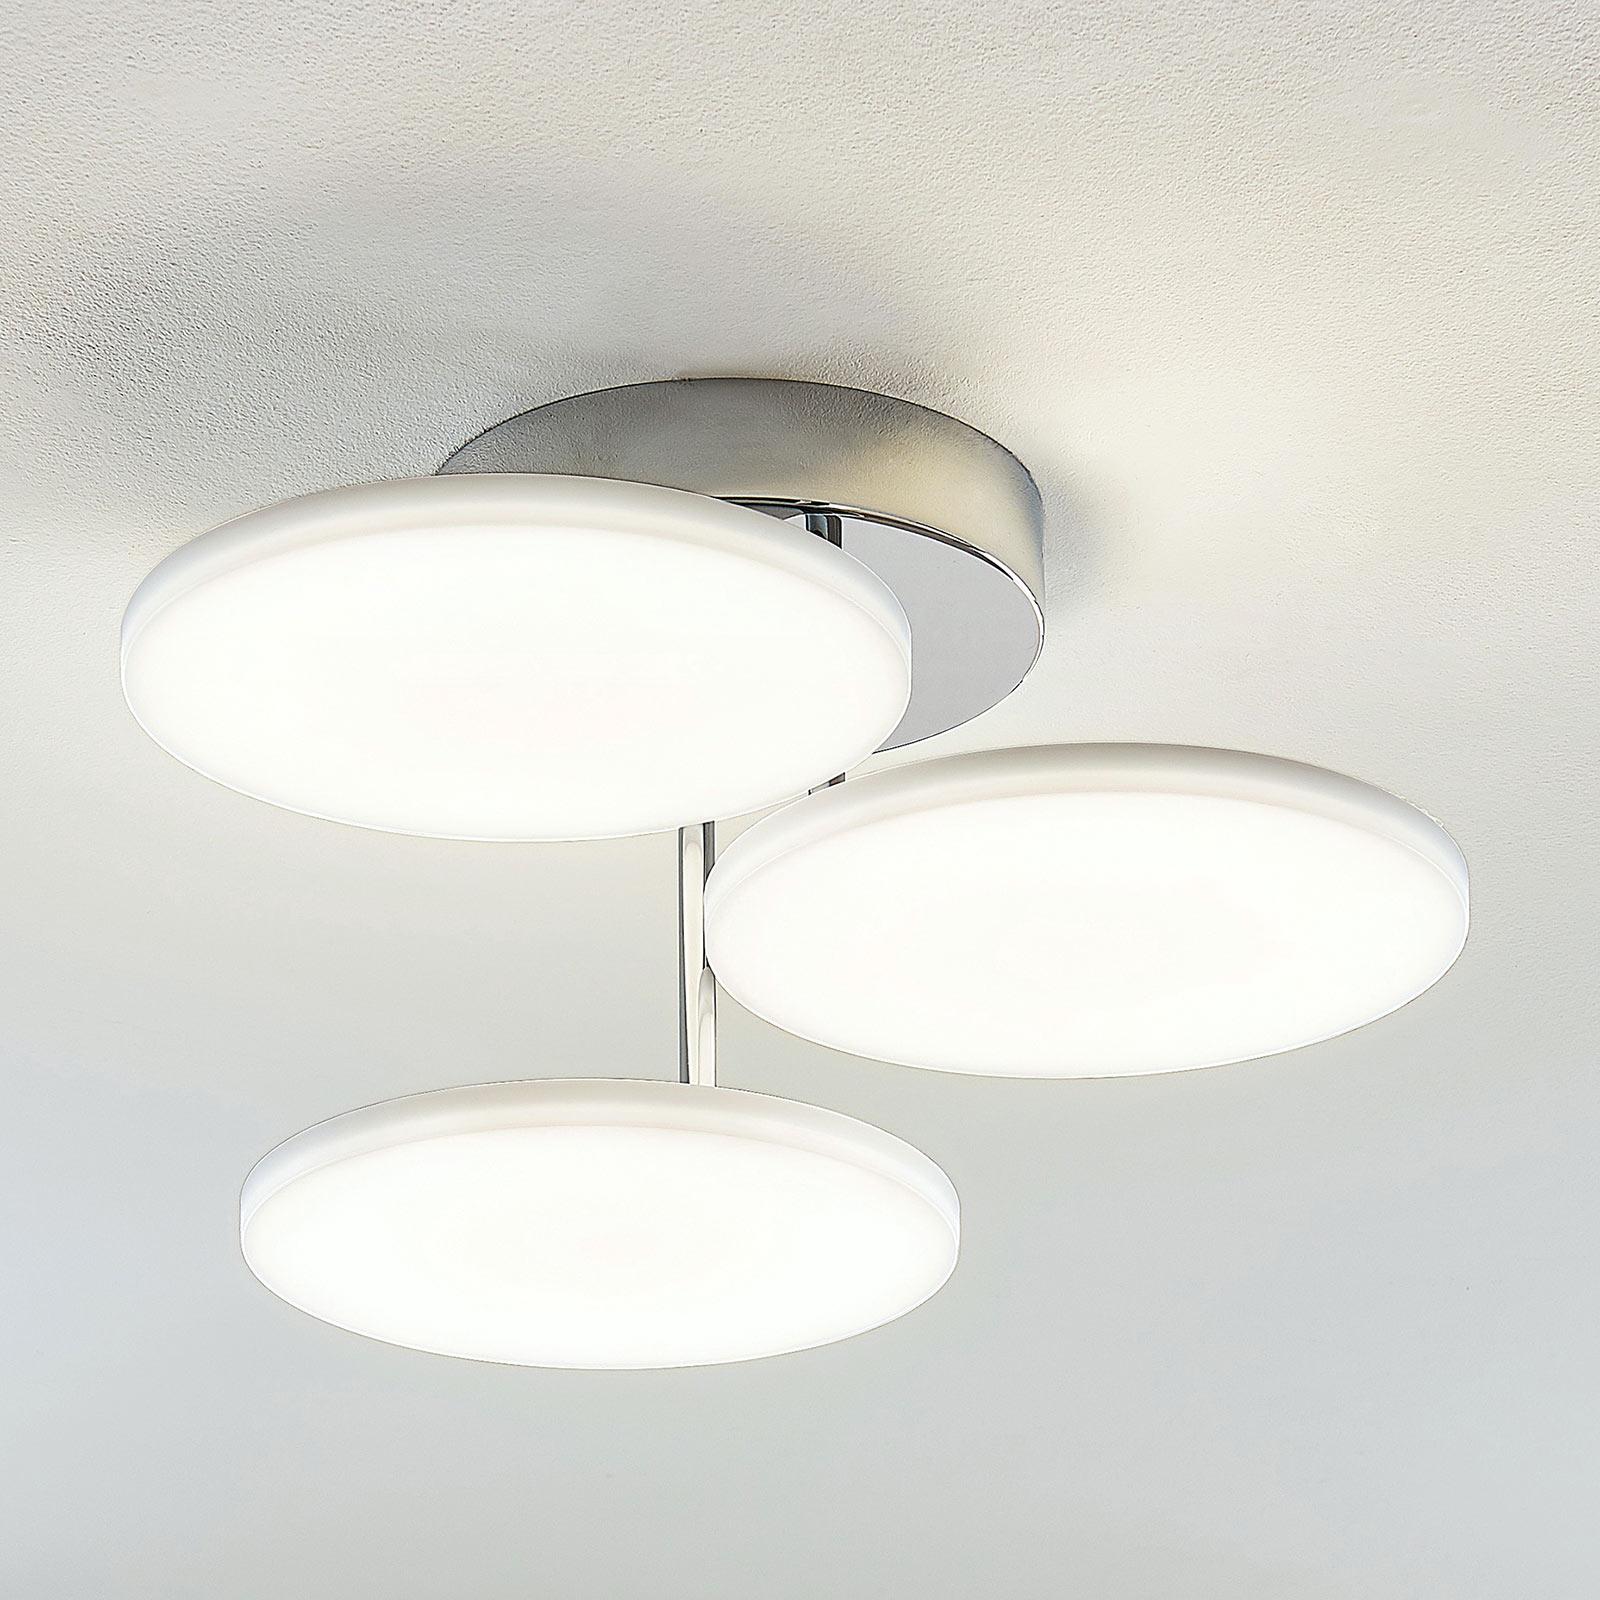 LED plafondlamp Sherko, dimbaar, 3-lamps